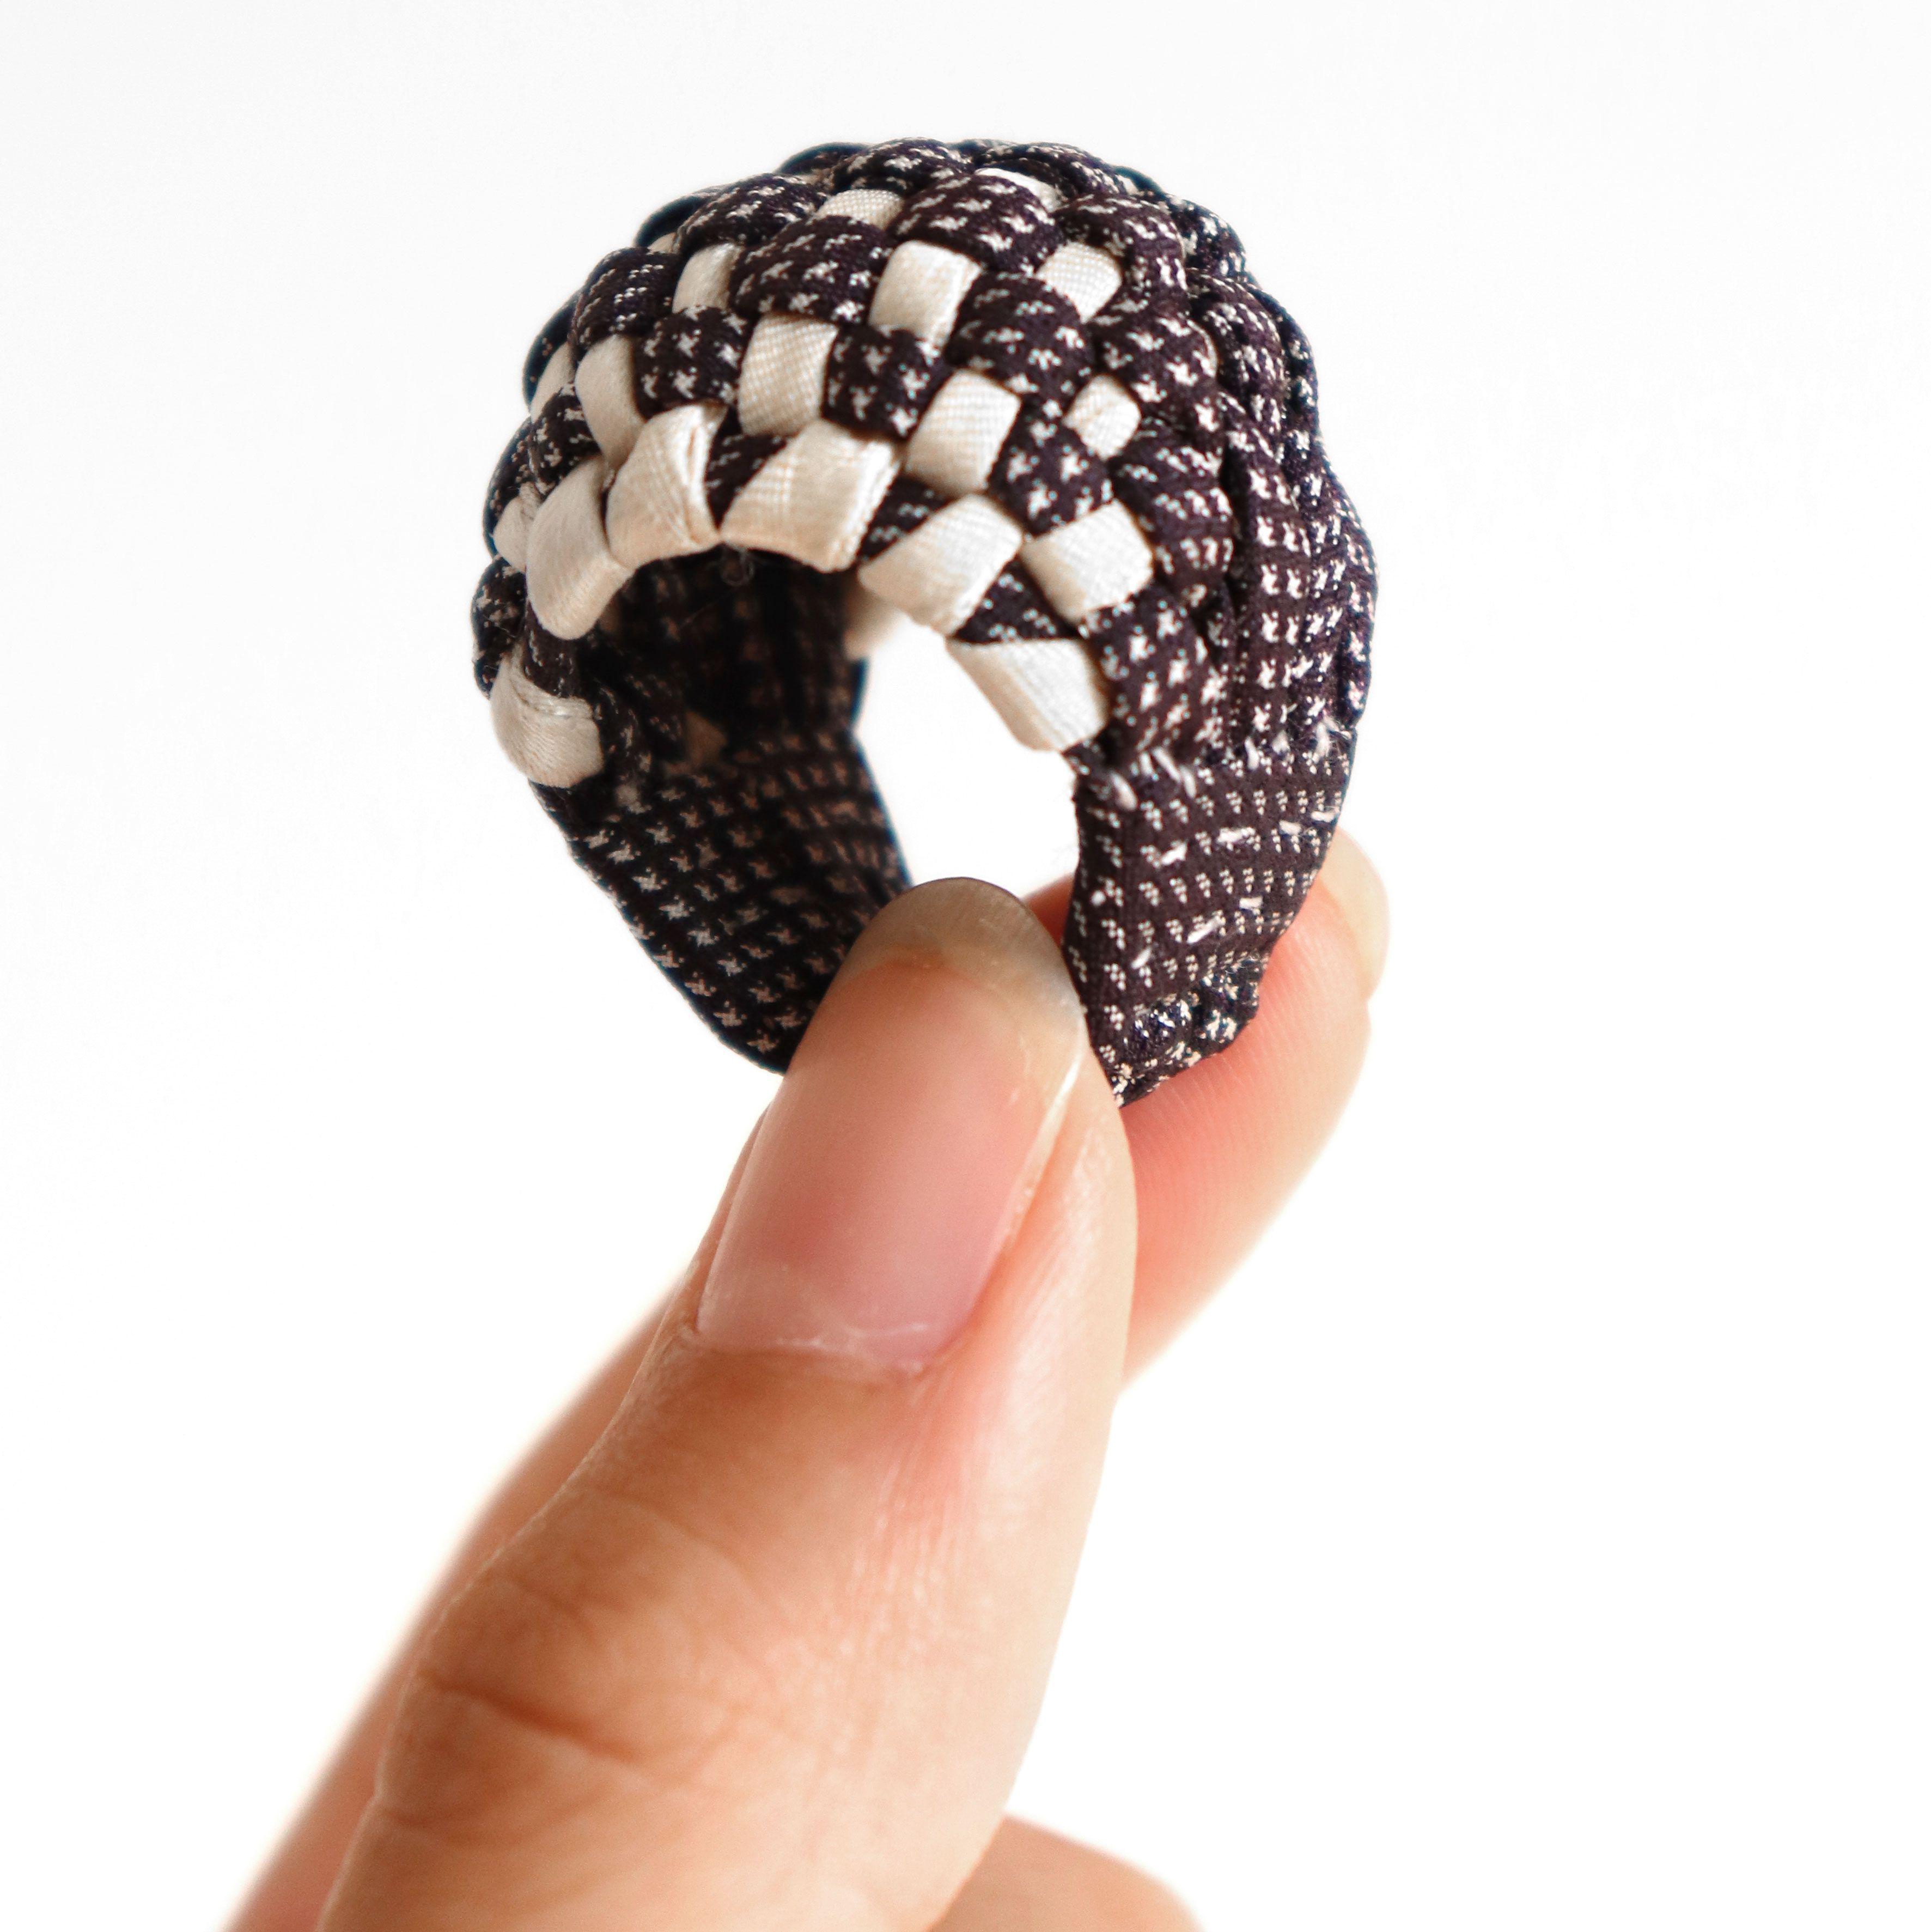 Statement Contemporary Art Jewelry Tamagit ring Yumi Kato